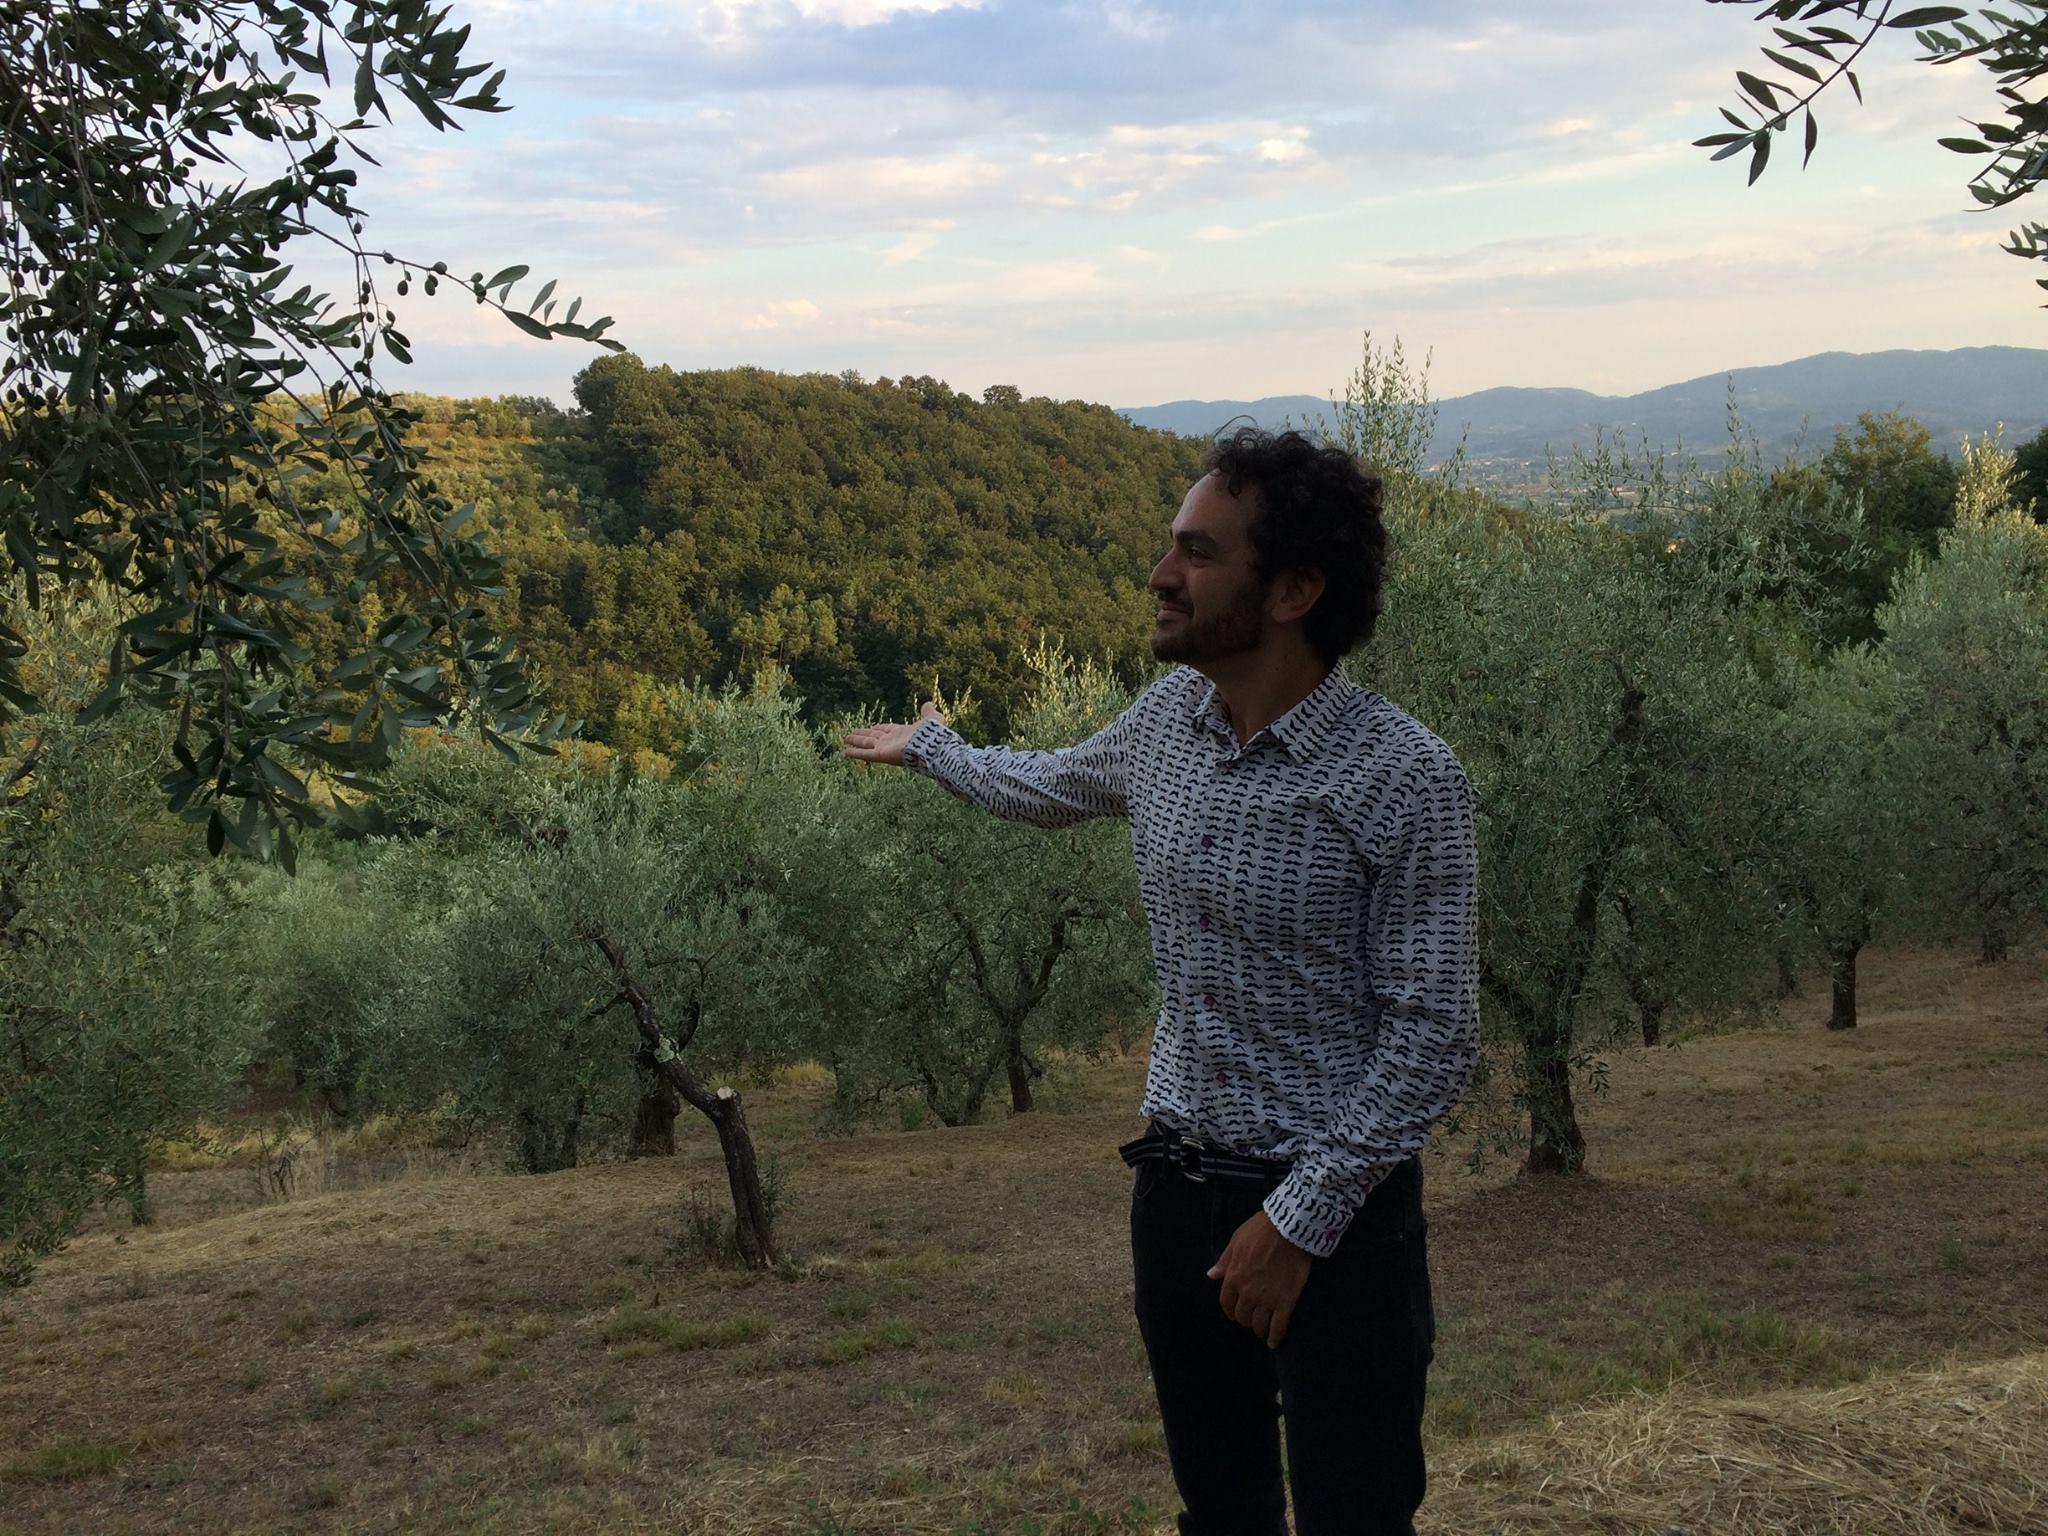 Riccardo Barontini